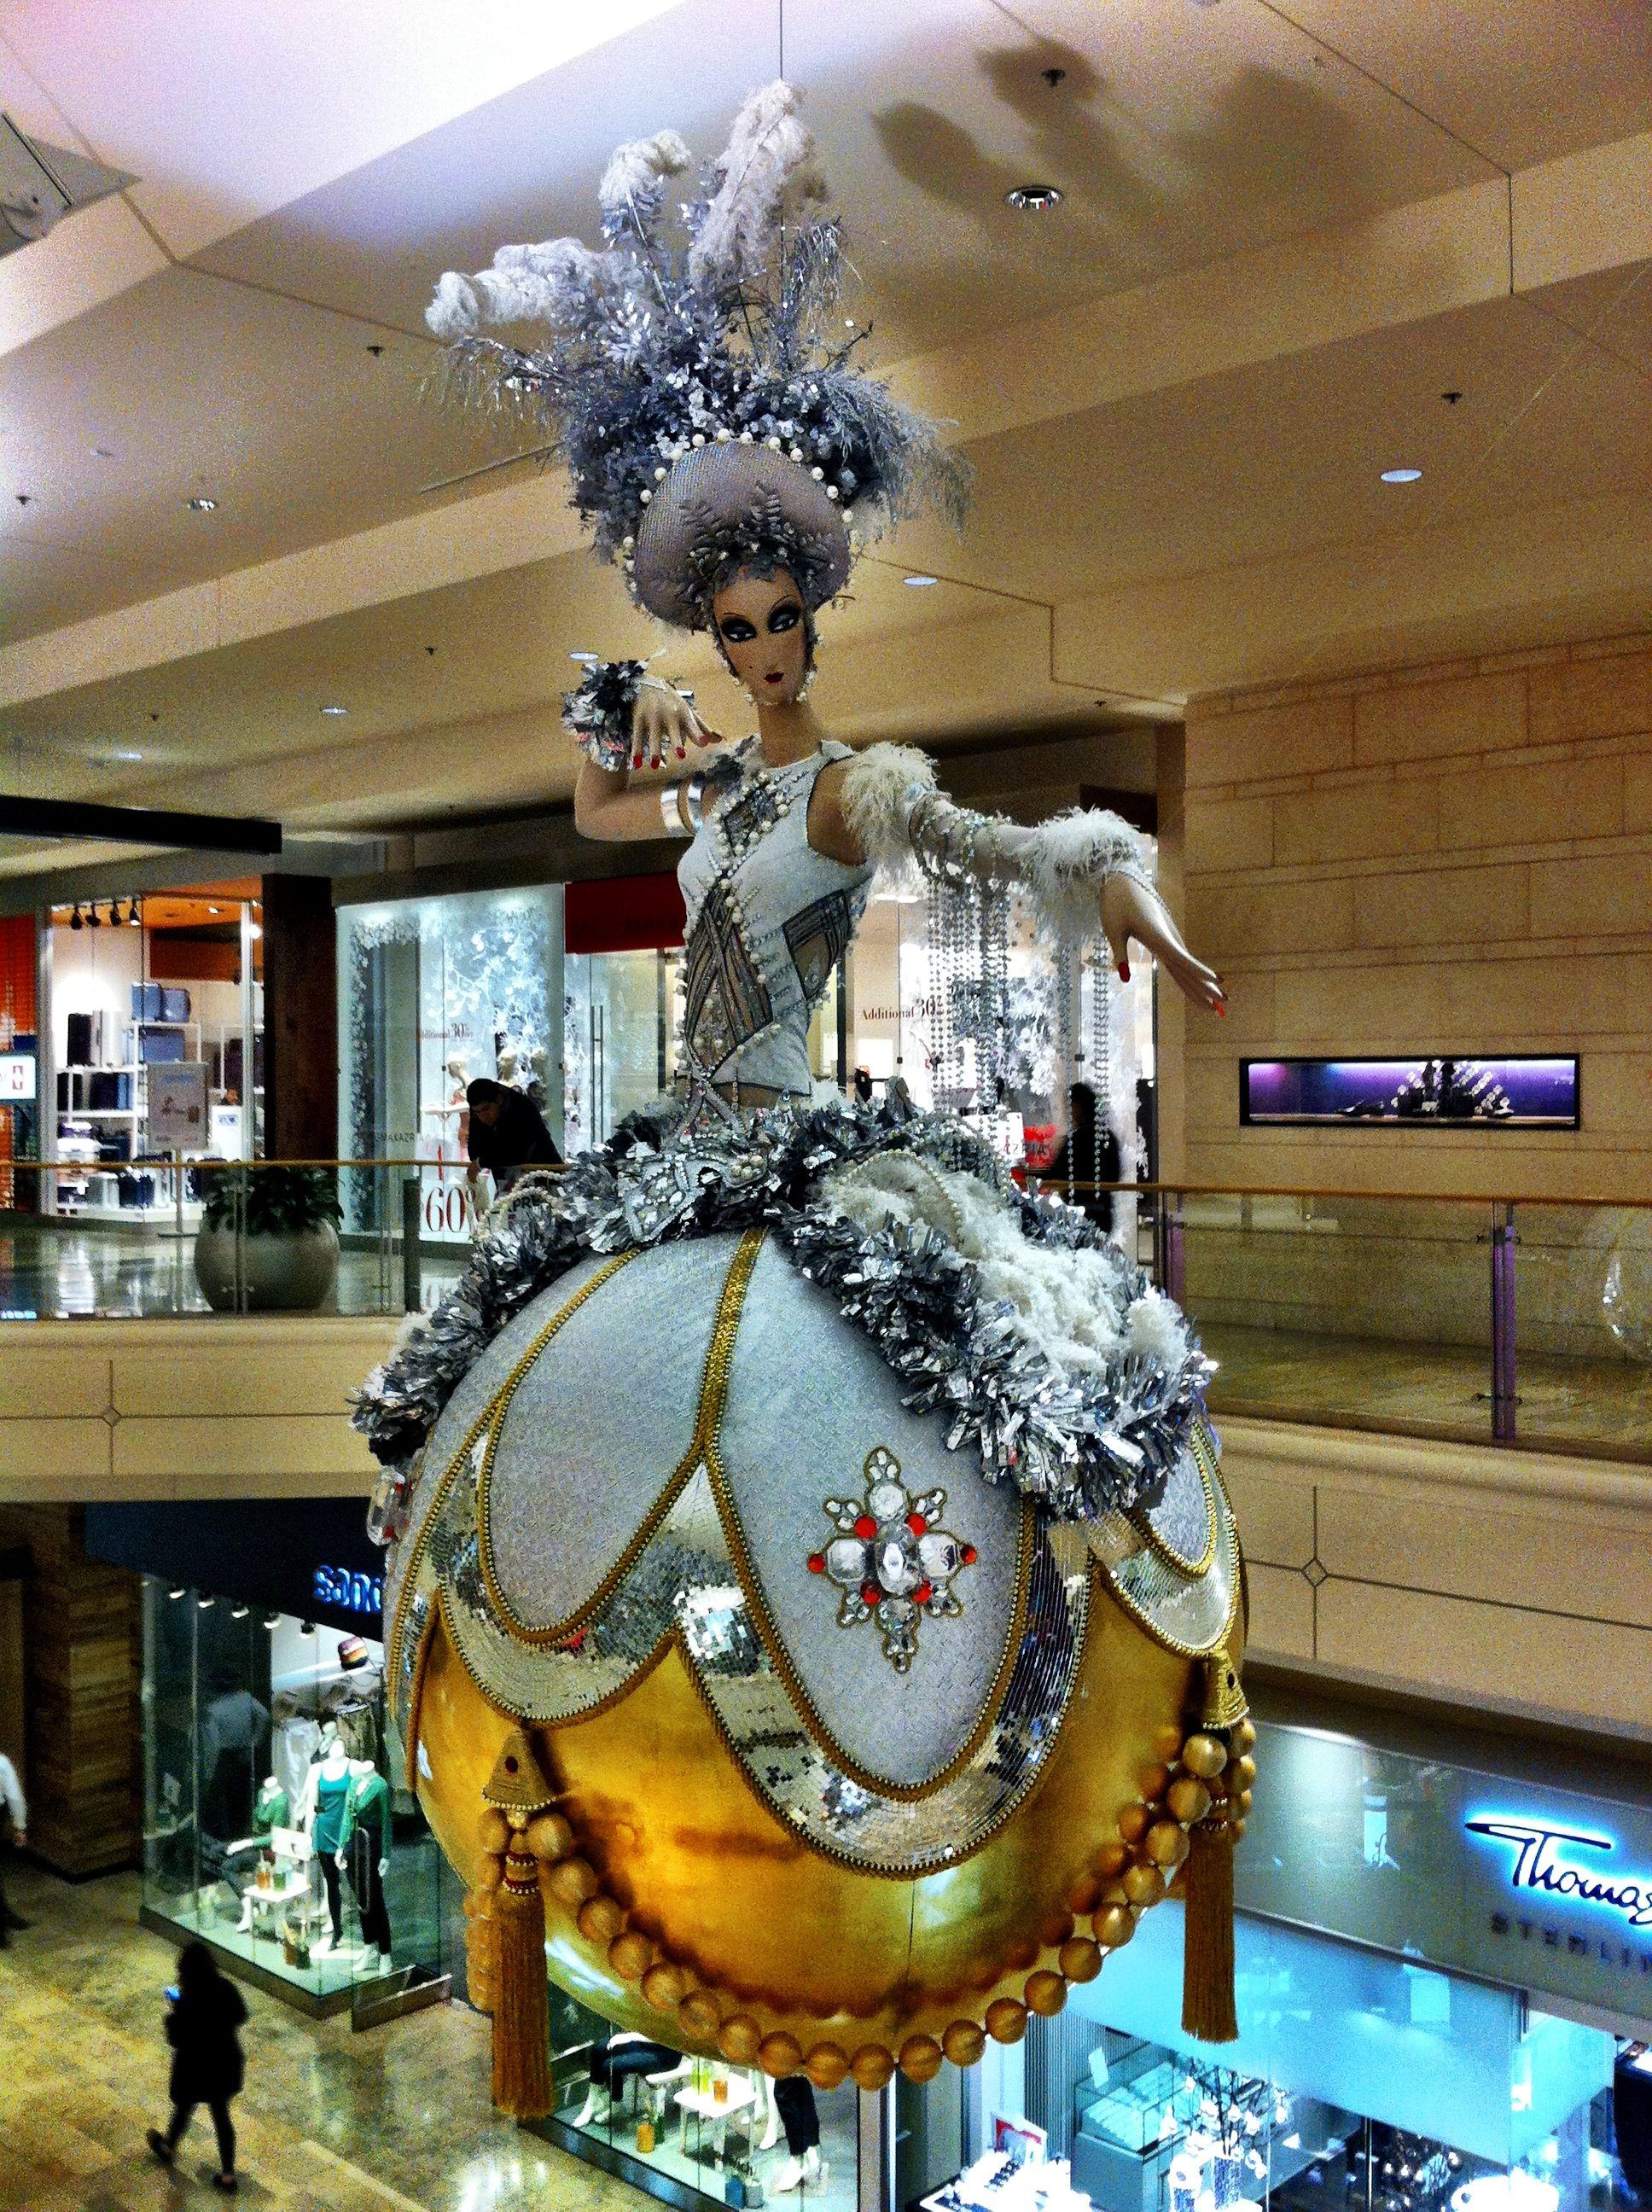 Wow Extravagant Mall Christmas Decoration Commercial Christmas Decorations Mall Decor Christmas Decorations